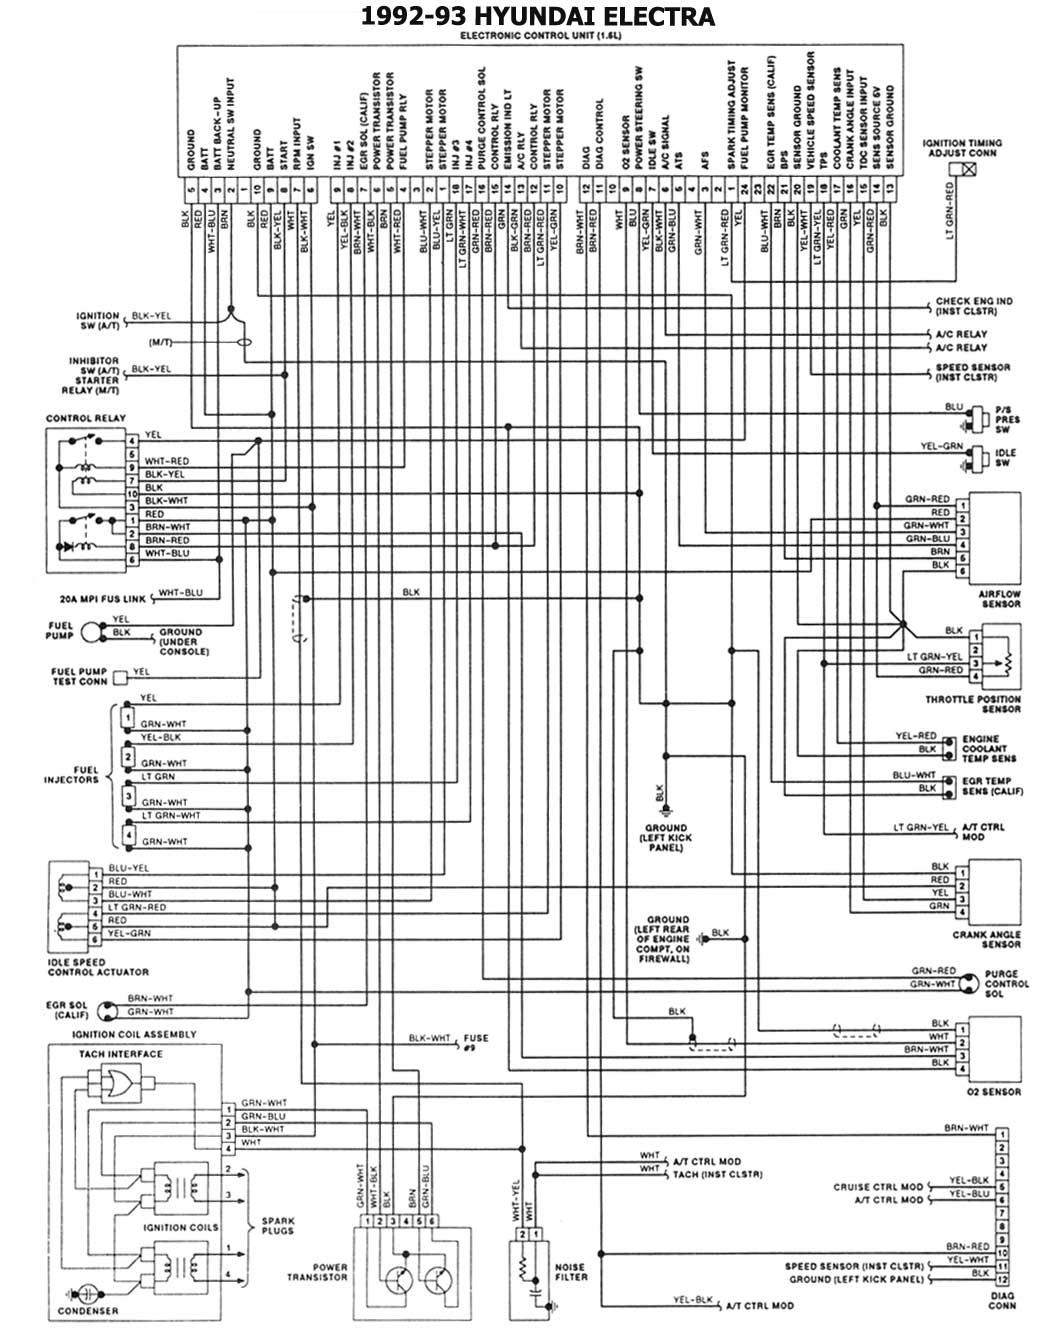 Hyundai 1986 97 Diagramas Esquemas Ubicacion De